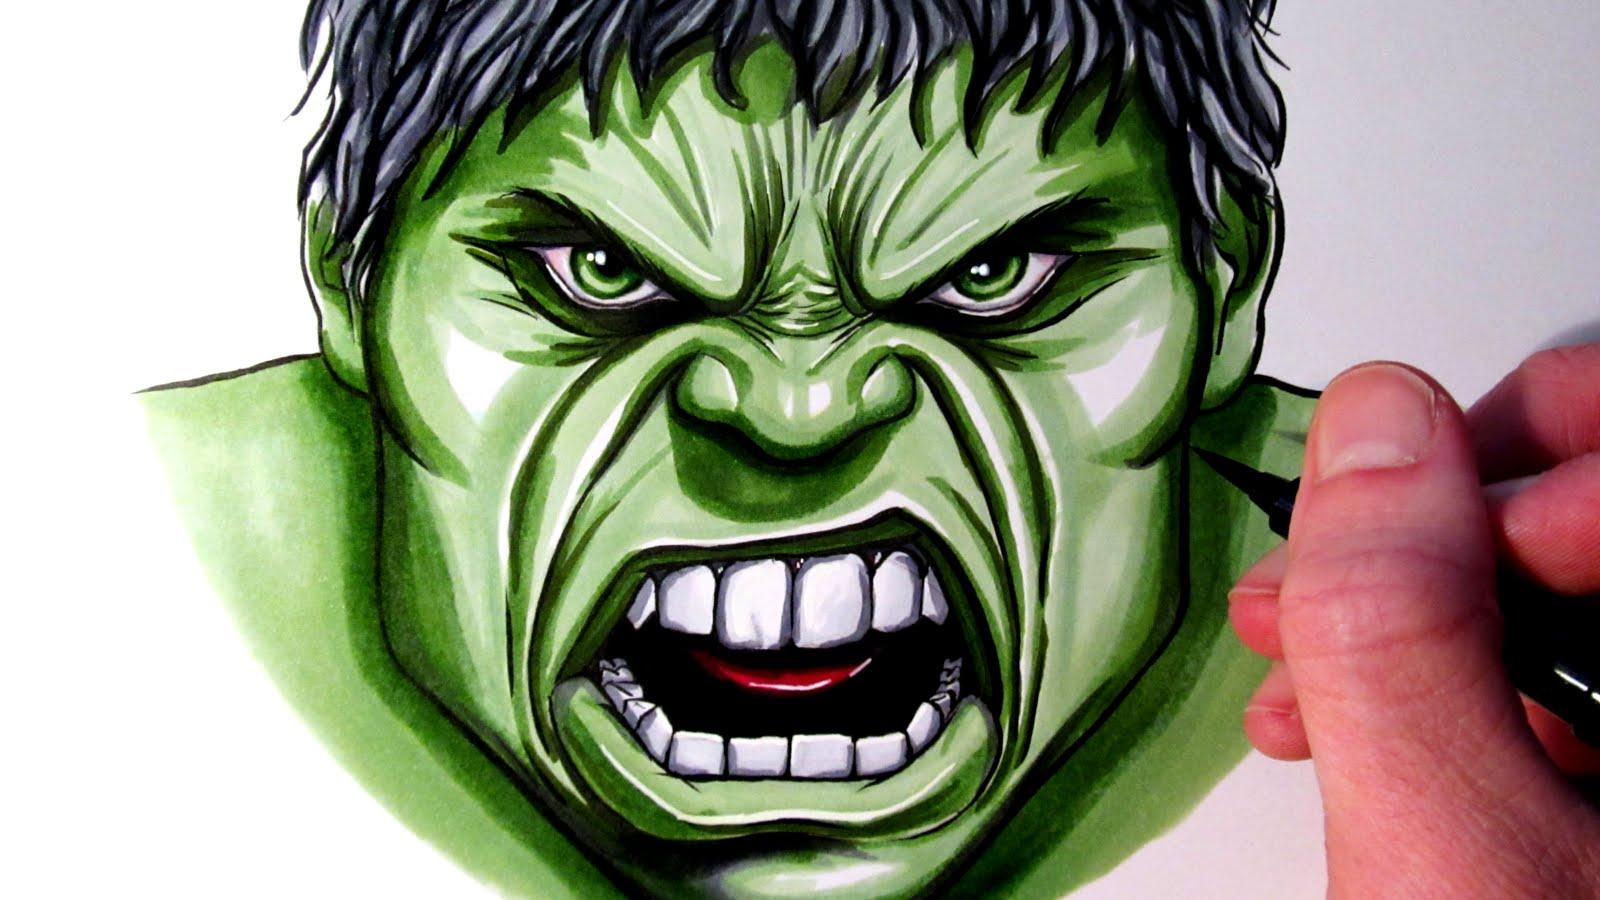 1600x900 Let's Draw The Hulk